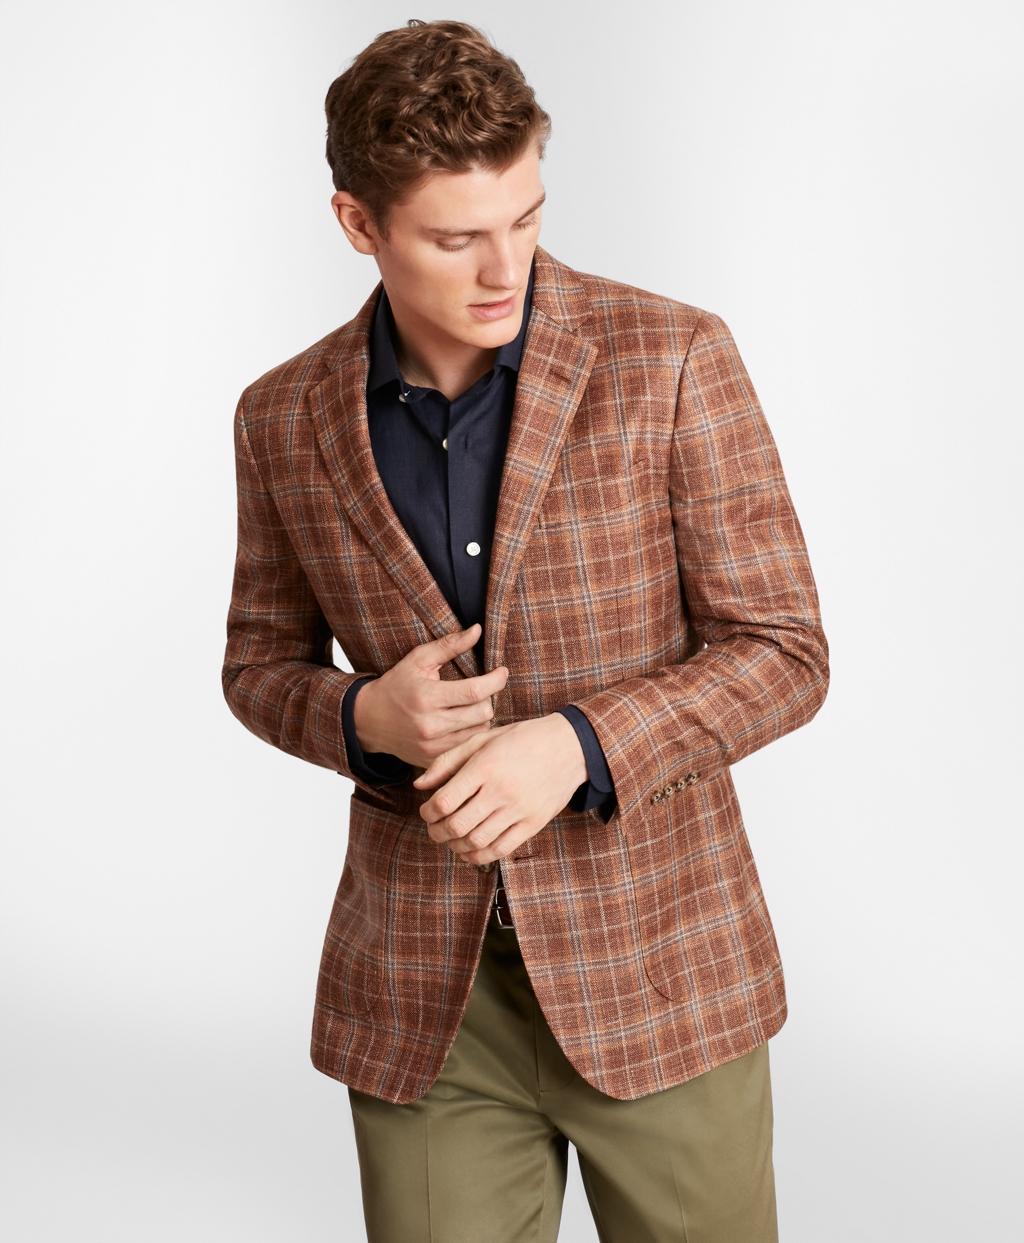 1960s Mens Suits | 70s Mens Disco Suits Brooks Brothers Mens Milano Fit Check Sport Coat $598.00 AT vintagedancer.com